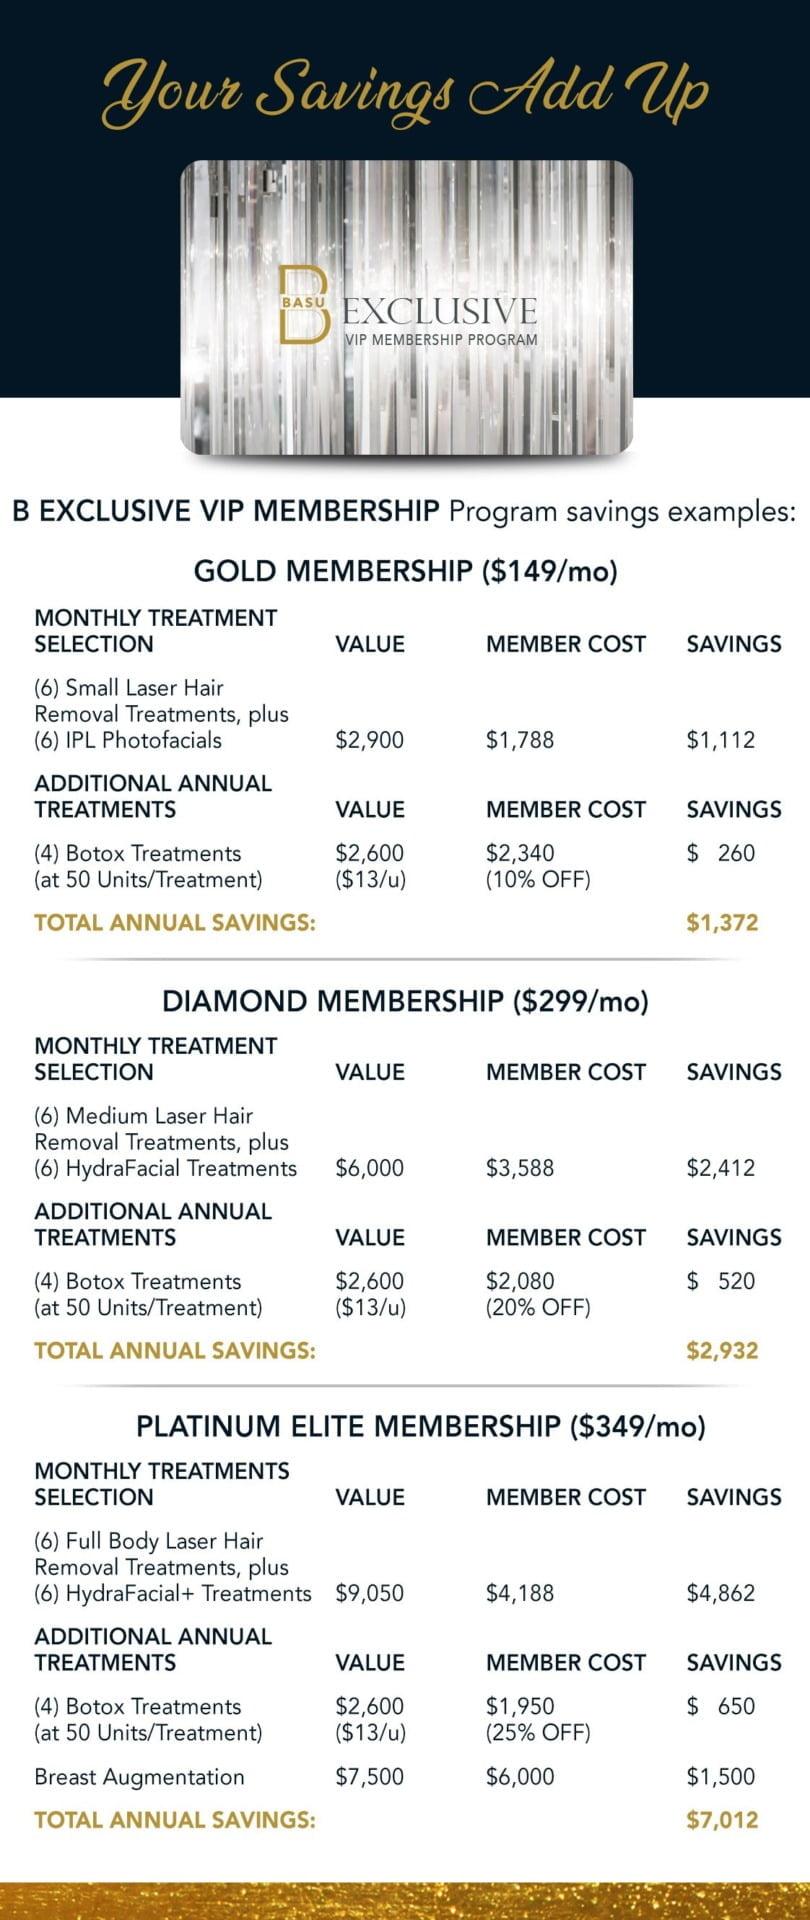 B Exclusive VIP Membership Program Savings